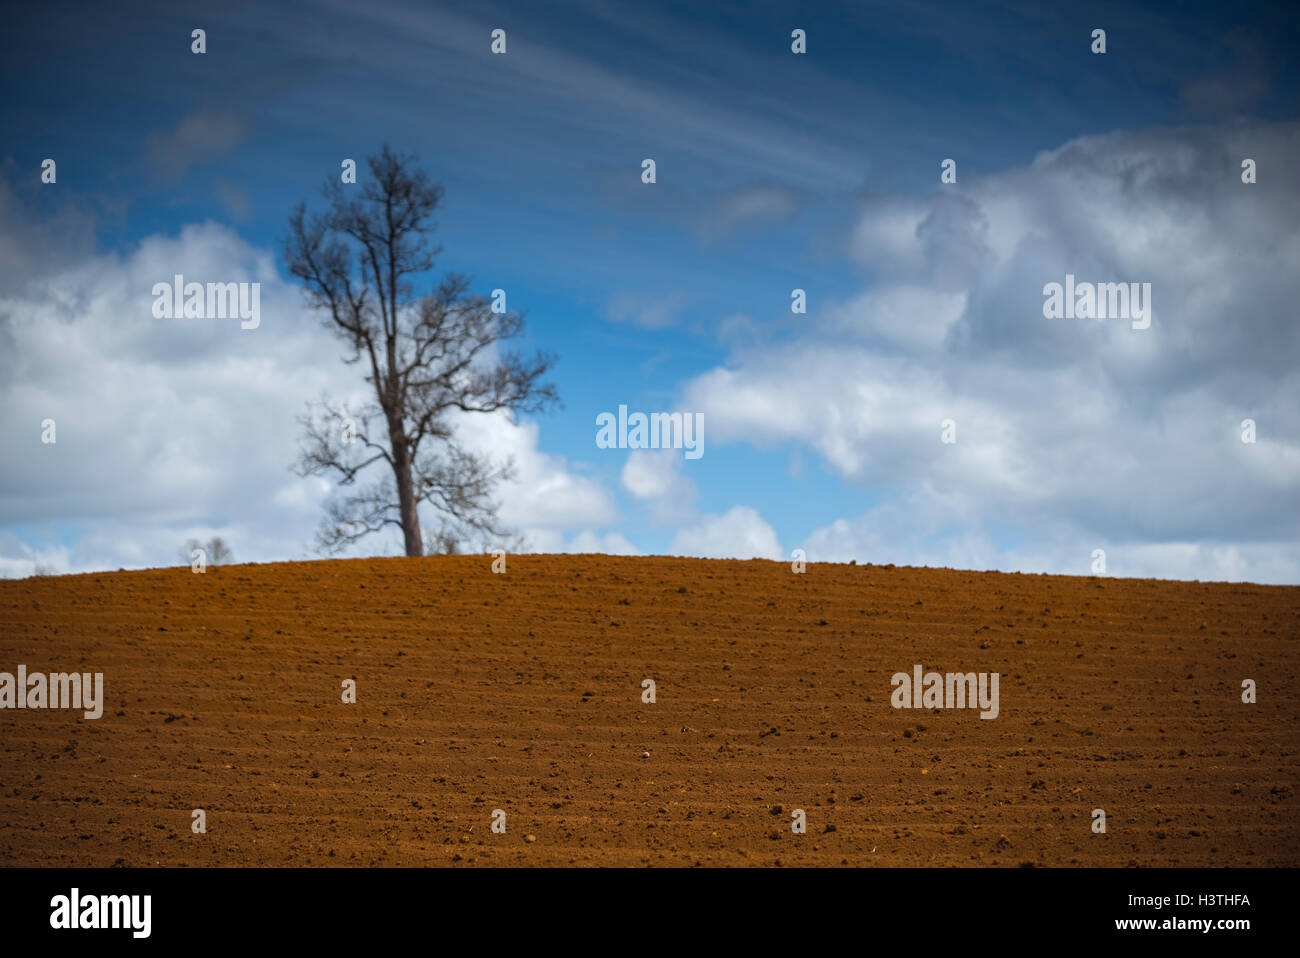 Land to grow. Osorno, Tha lakes Region, Chile - Stock Image